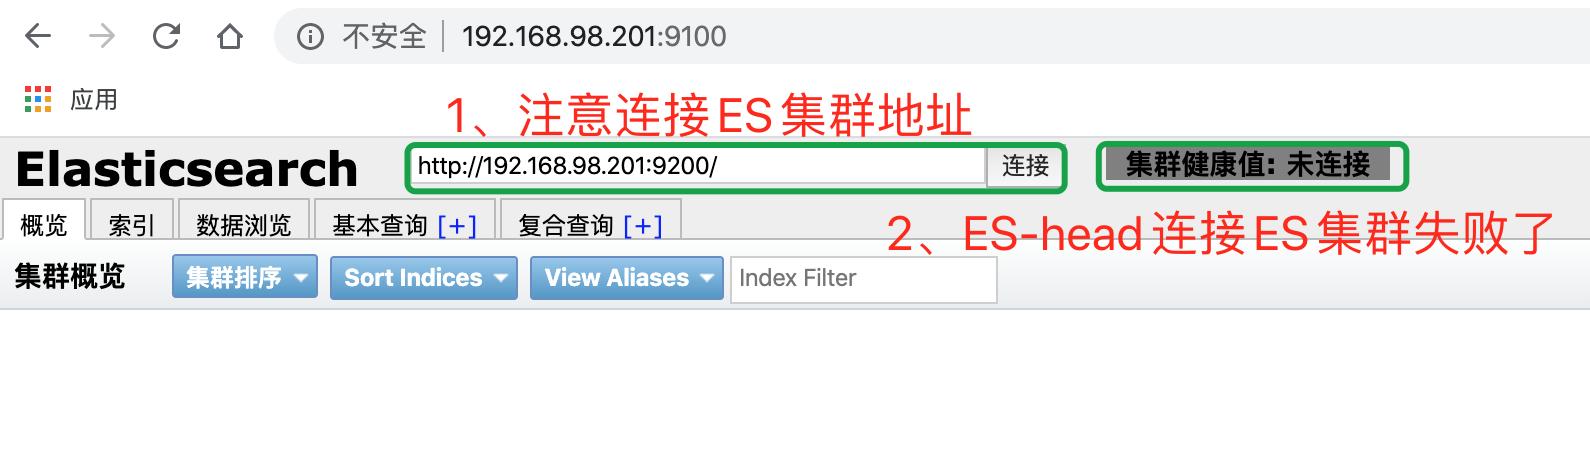 08_grunt_web启动验证.png